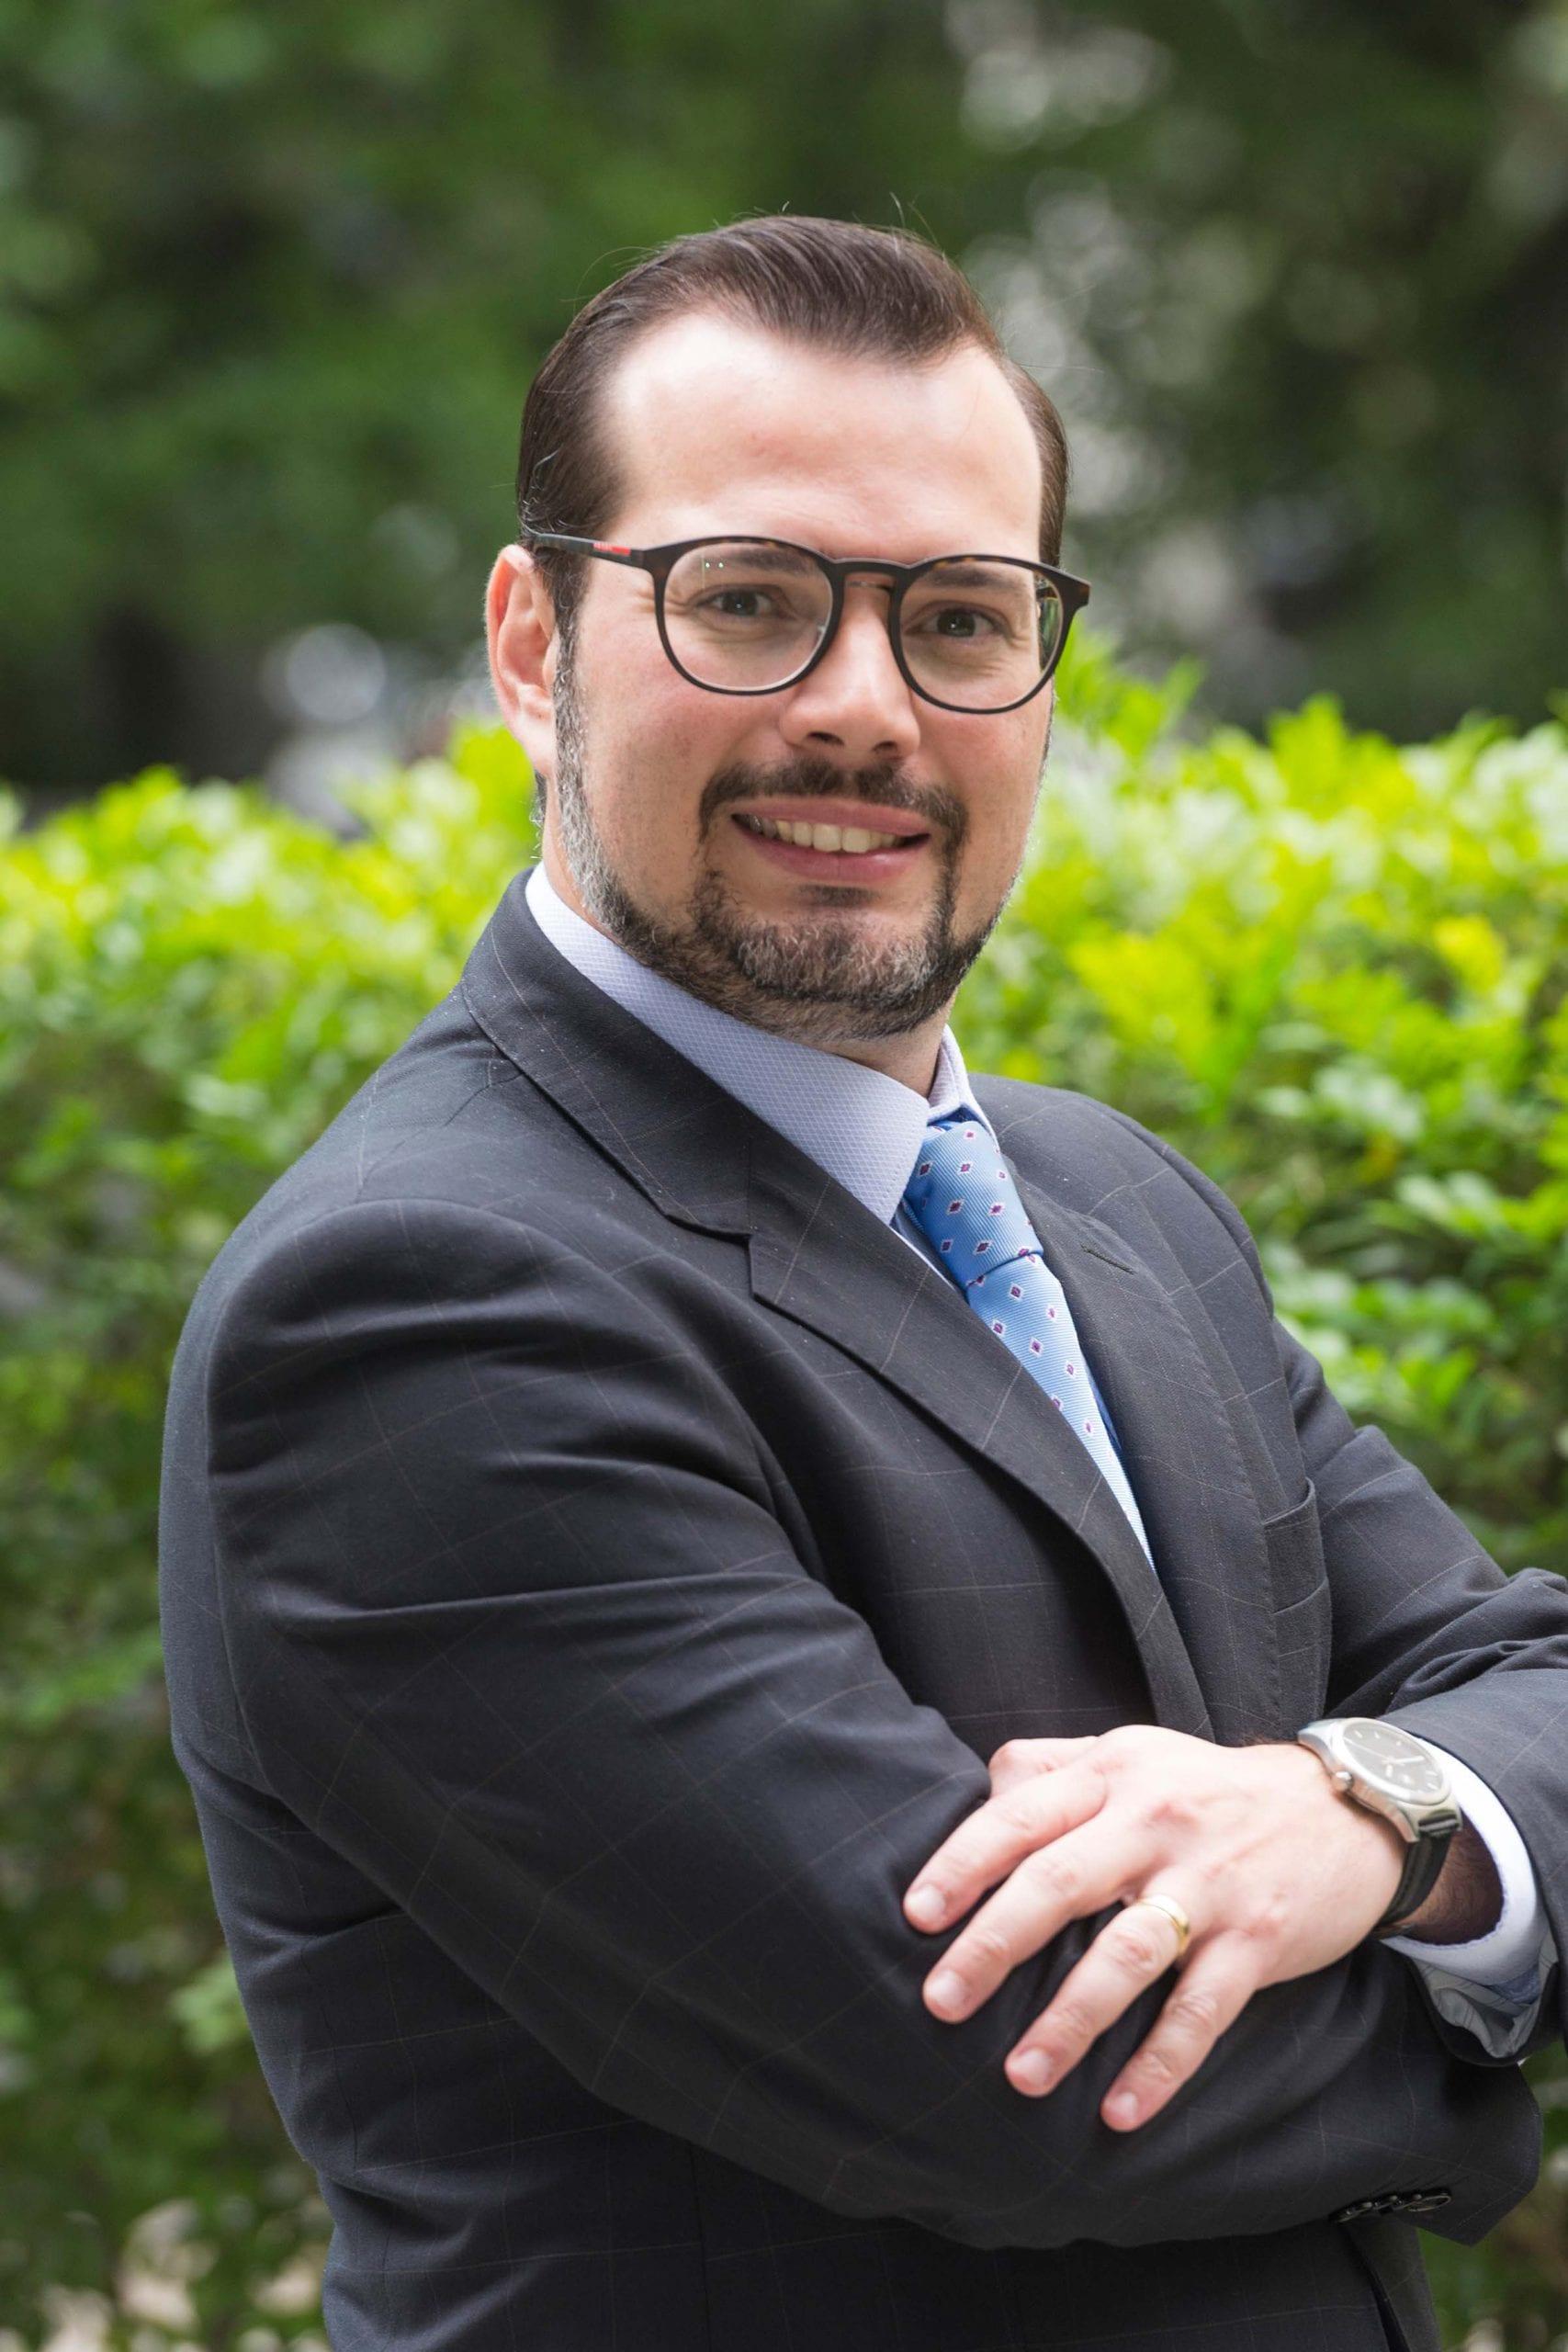 Carlos RV Silva Filho